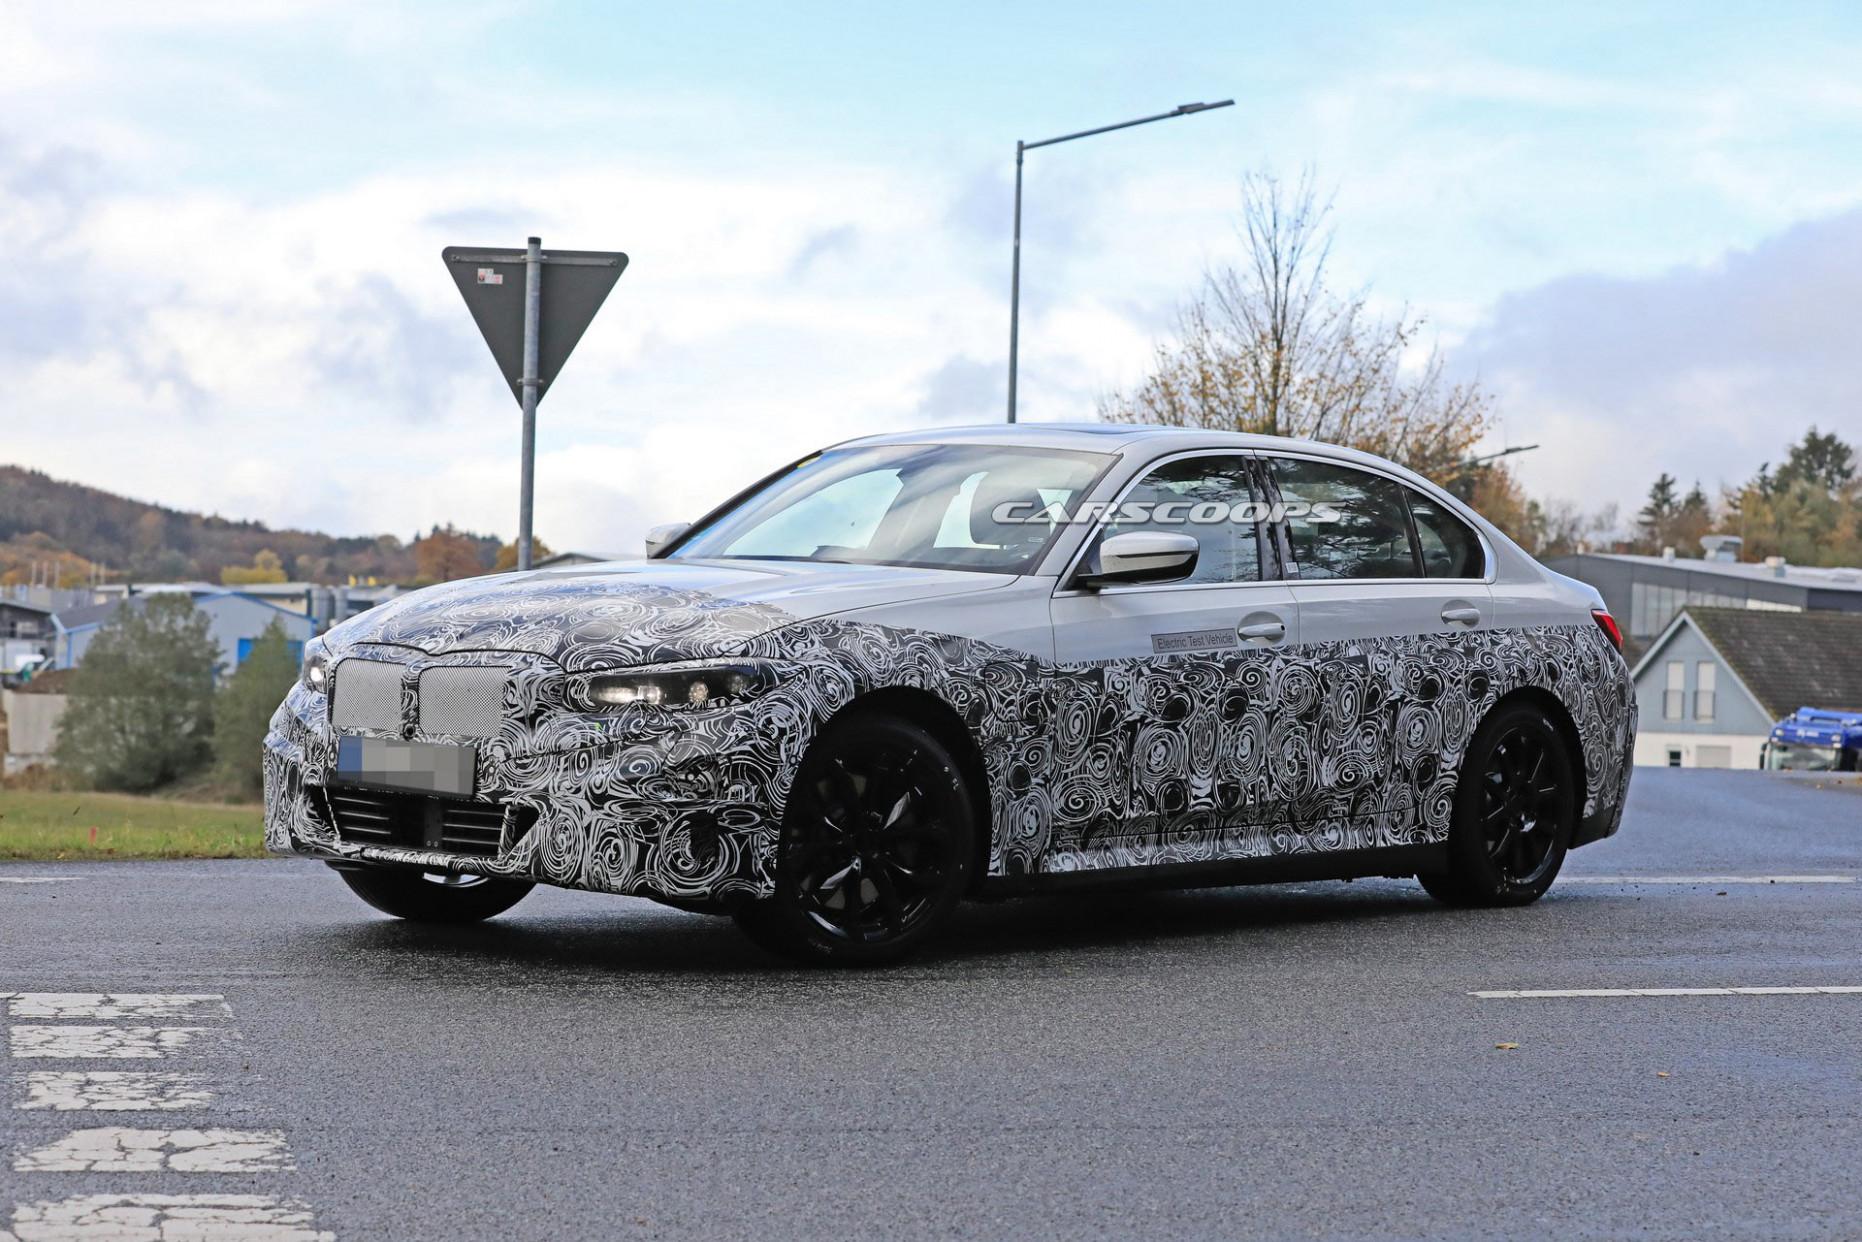 New Concept BMW Series 3 2022